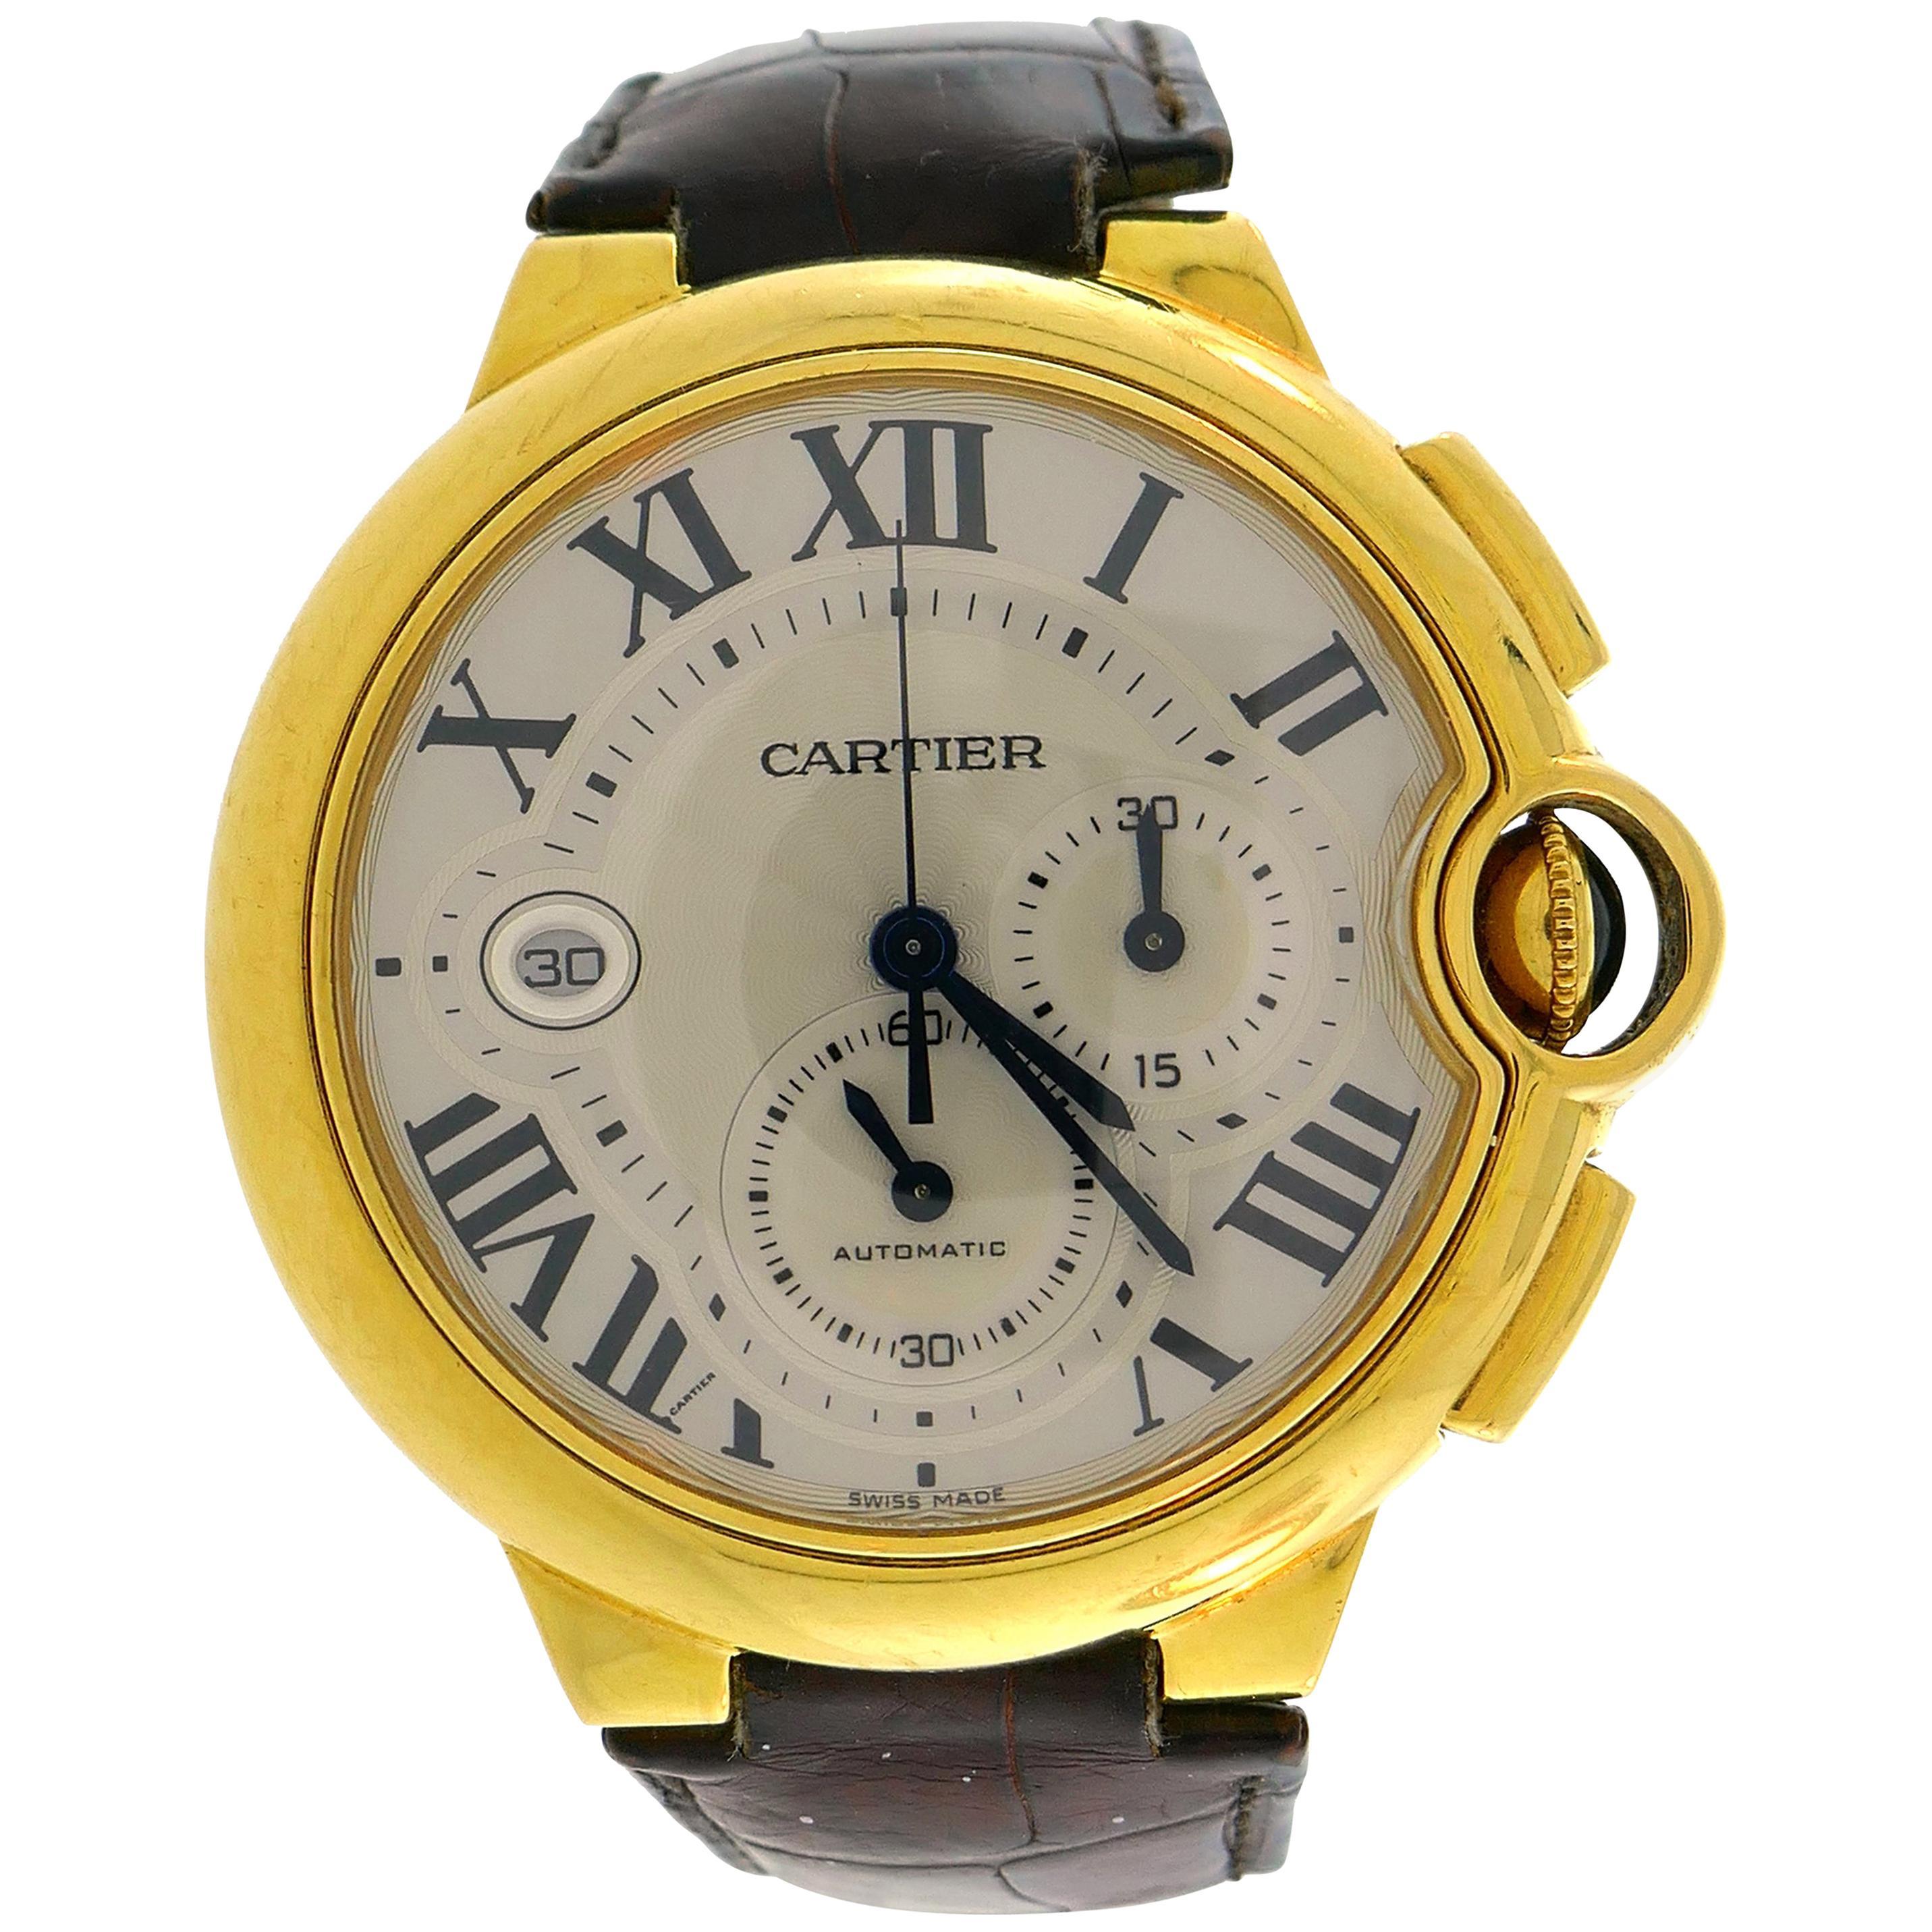 Cartier Yellow Gold Ballon Bleu Automatic Wristwatch 44mm XL Chronograph